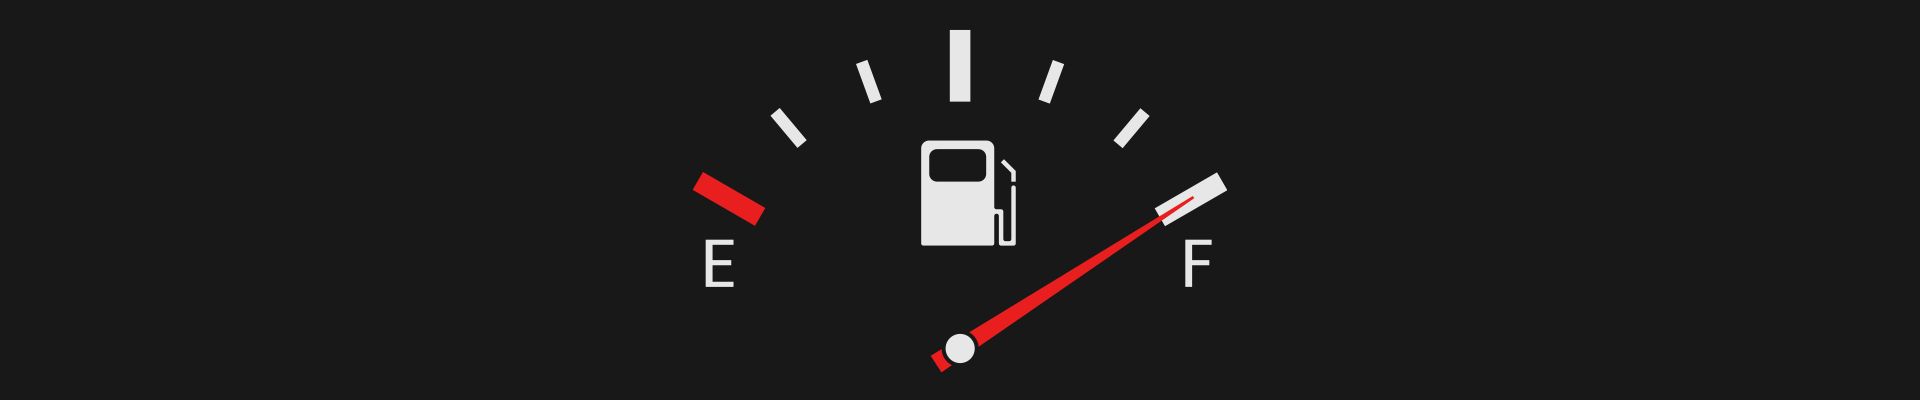 banner-tanque-lleno-ahorra-combustible